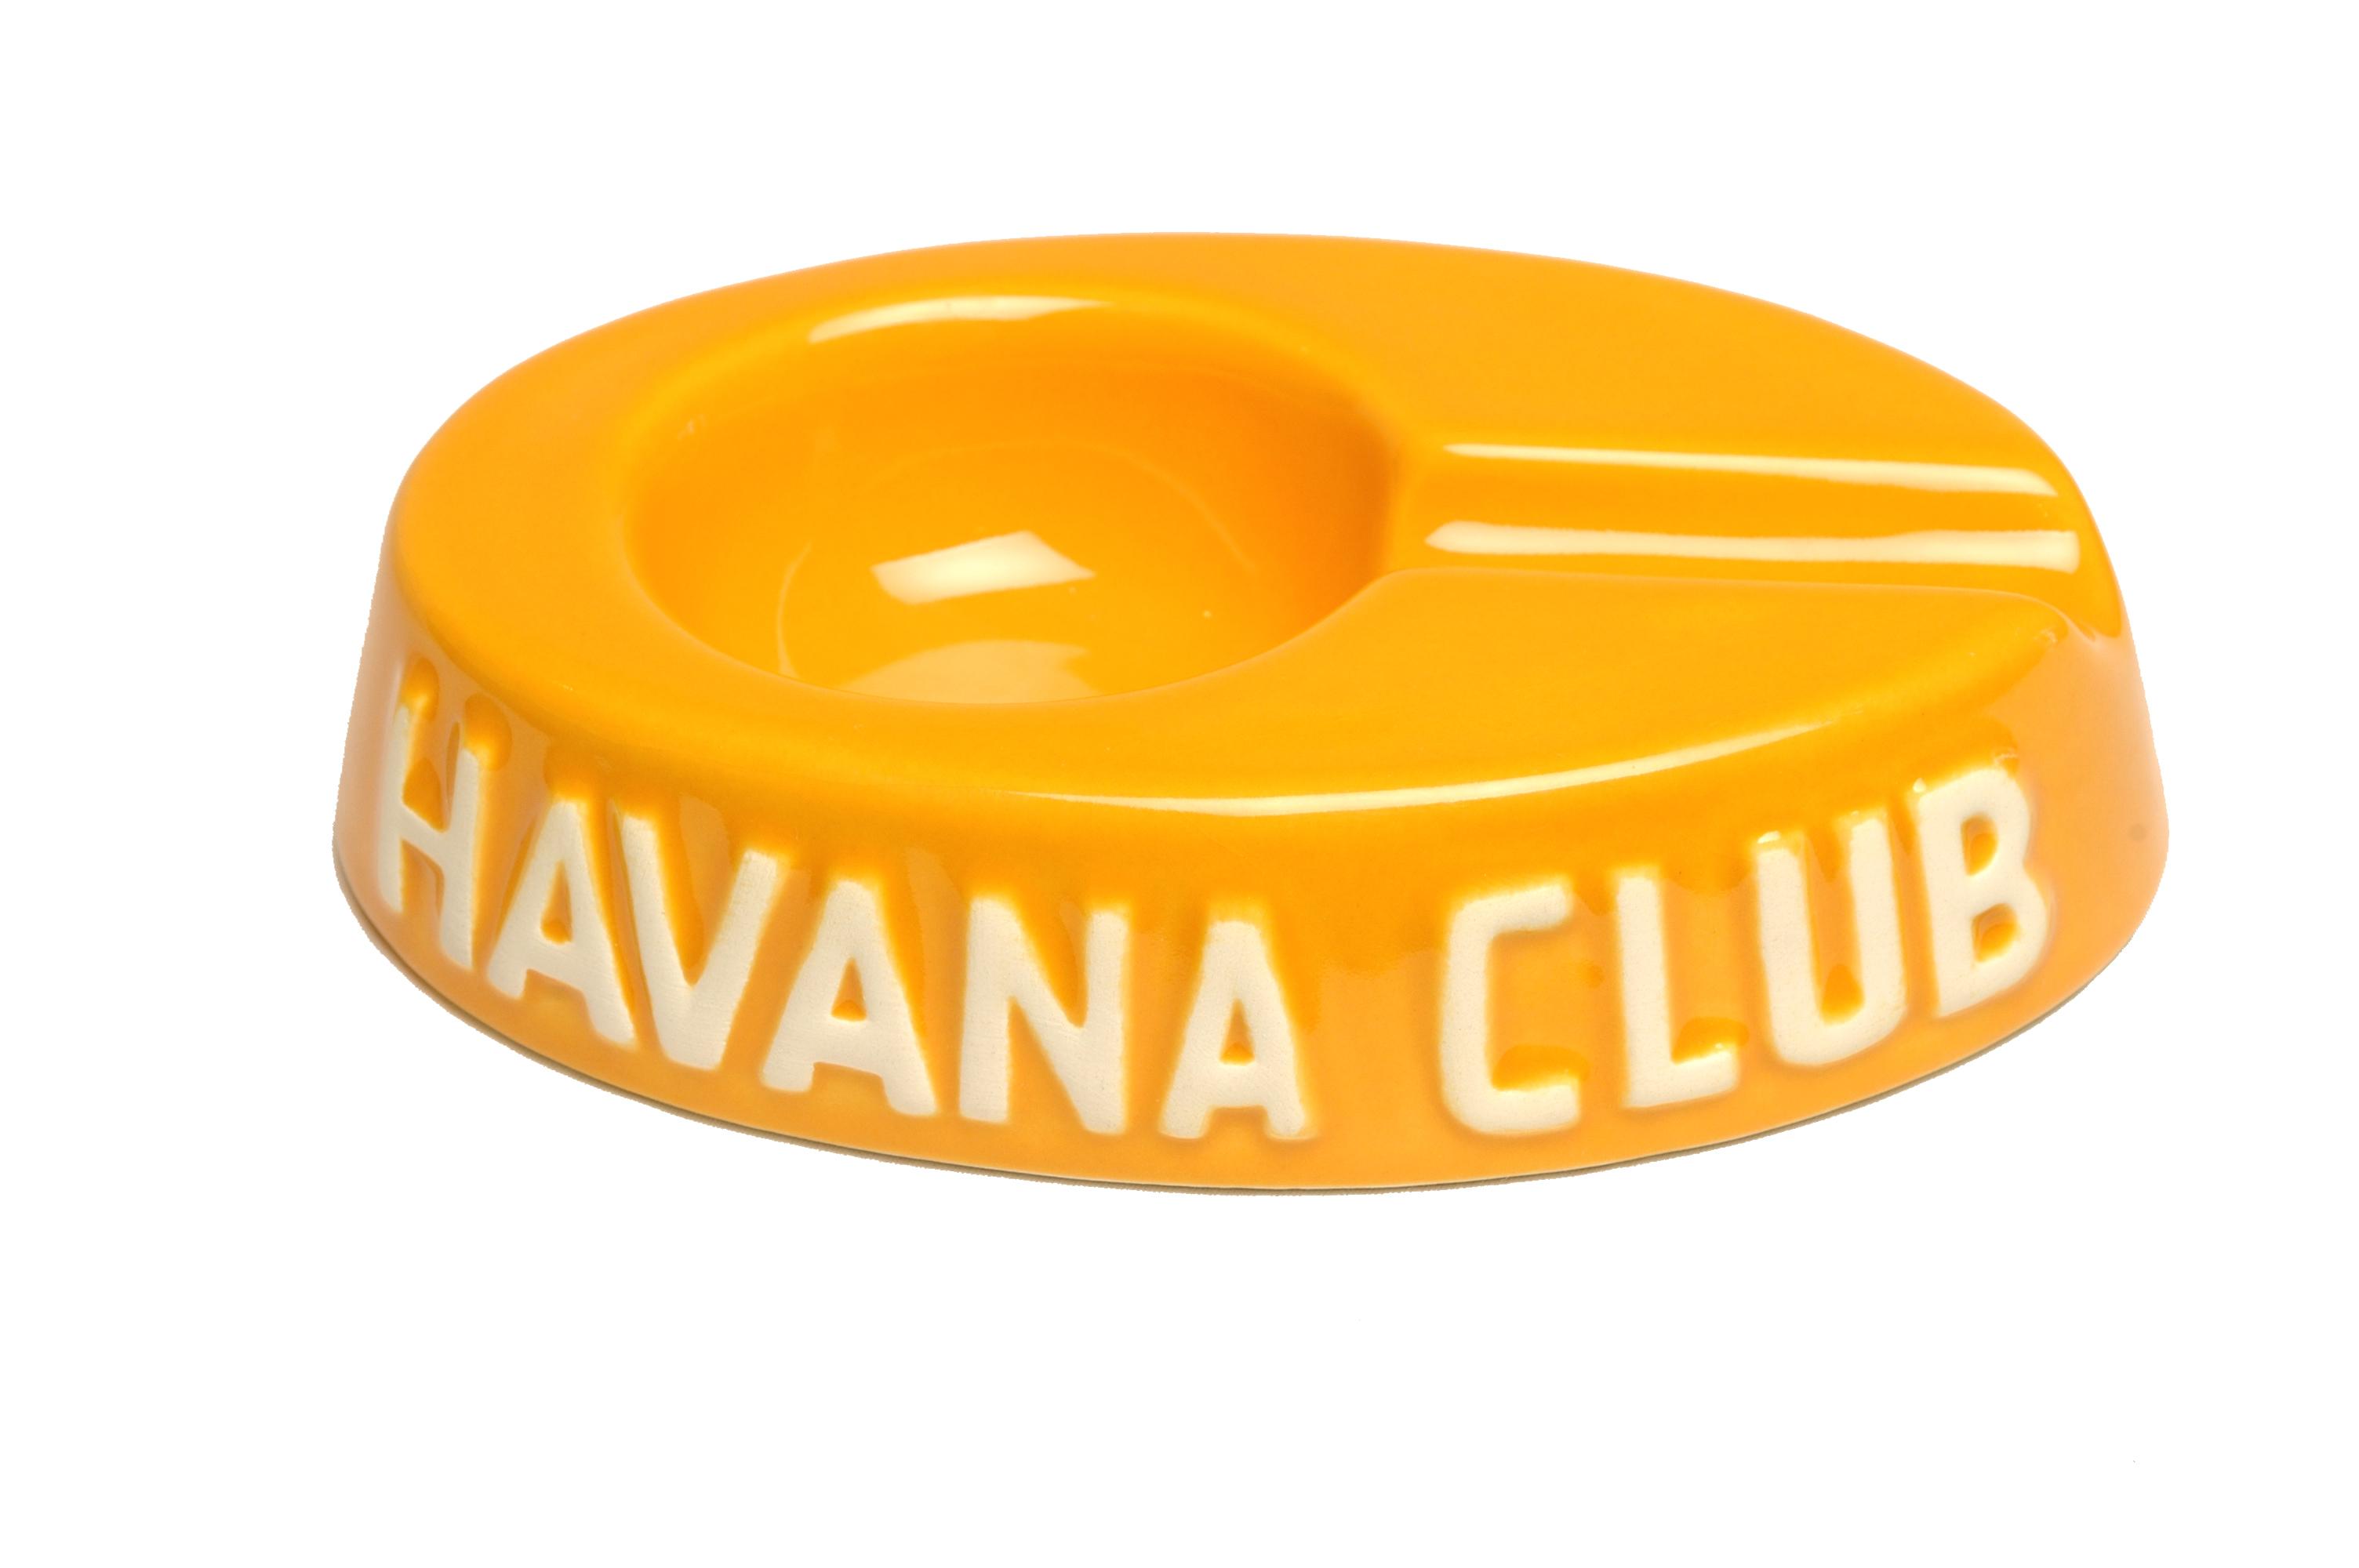 cendrier jaune havana club